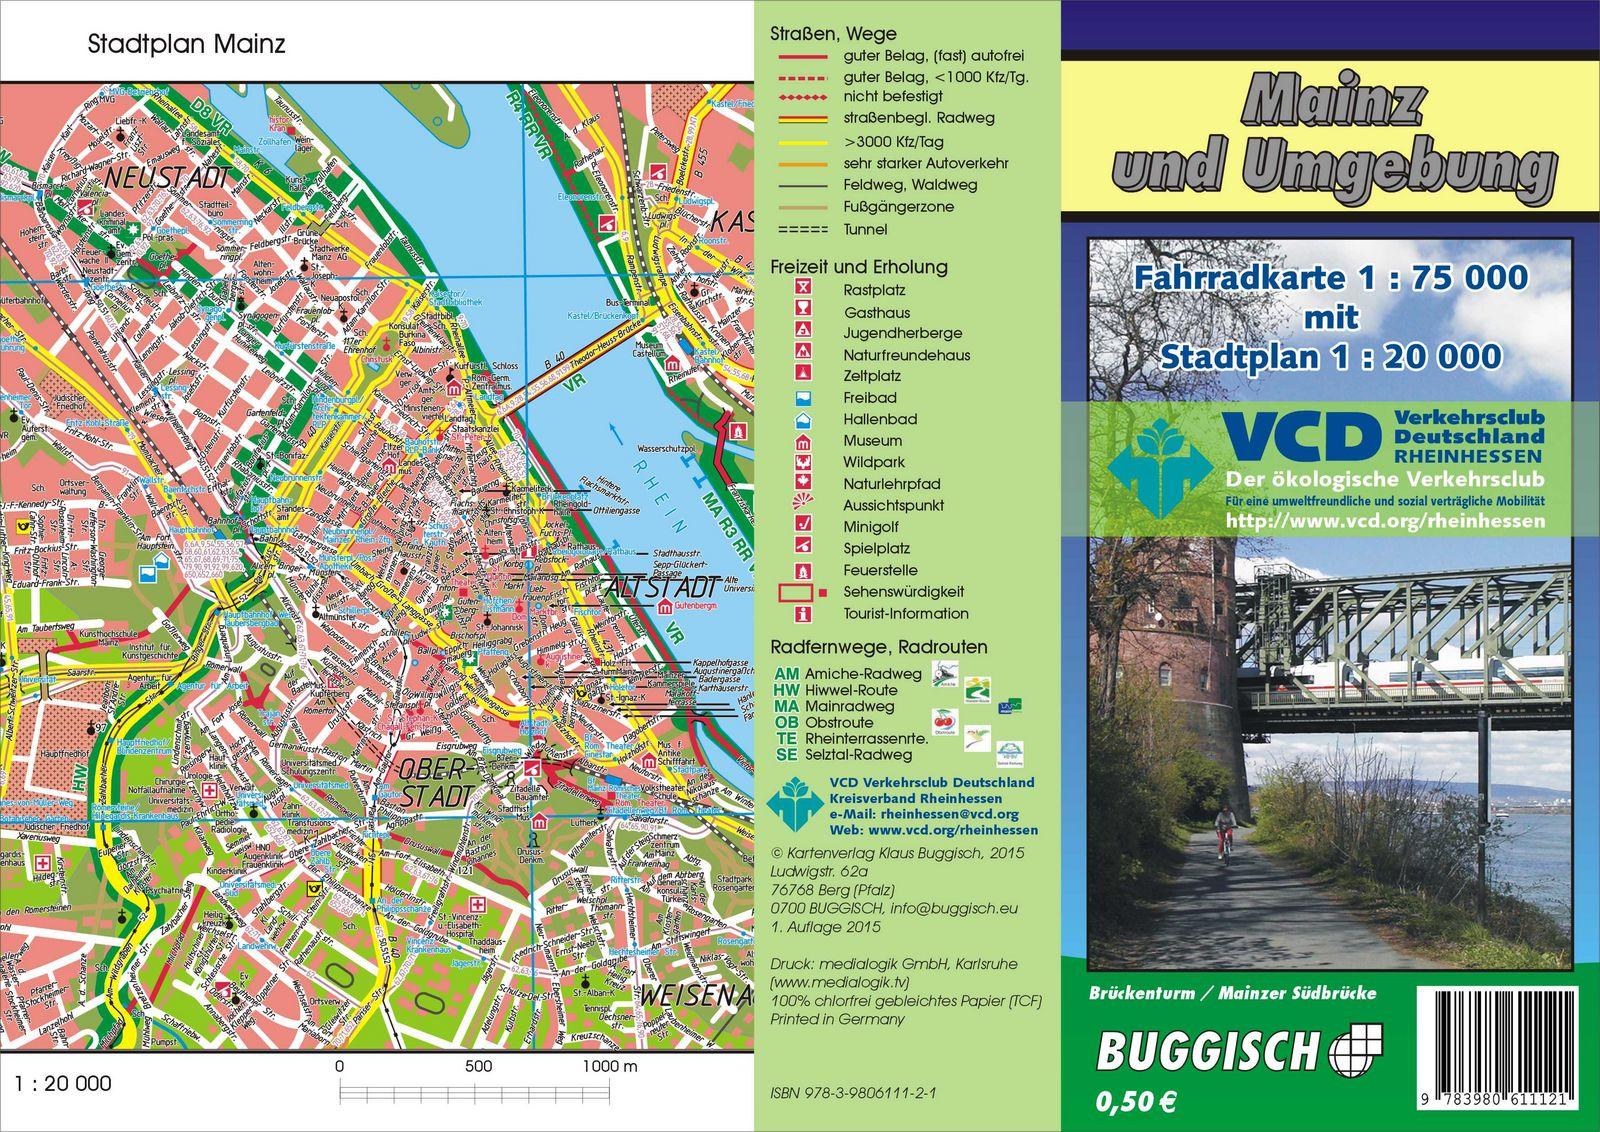 Side T303274rkei Karte.Karte Mainz Und Umgebung